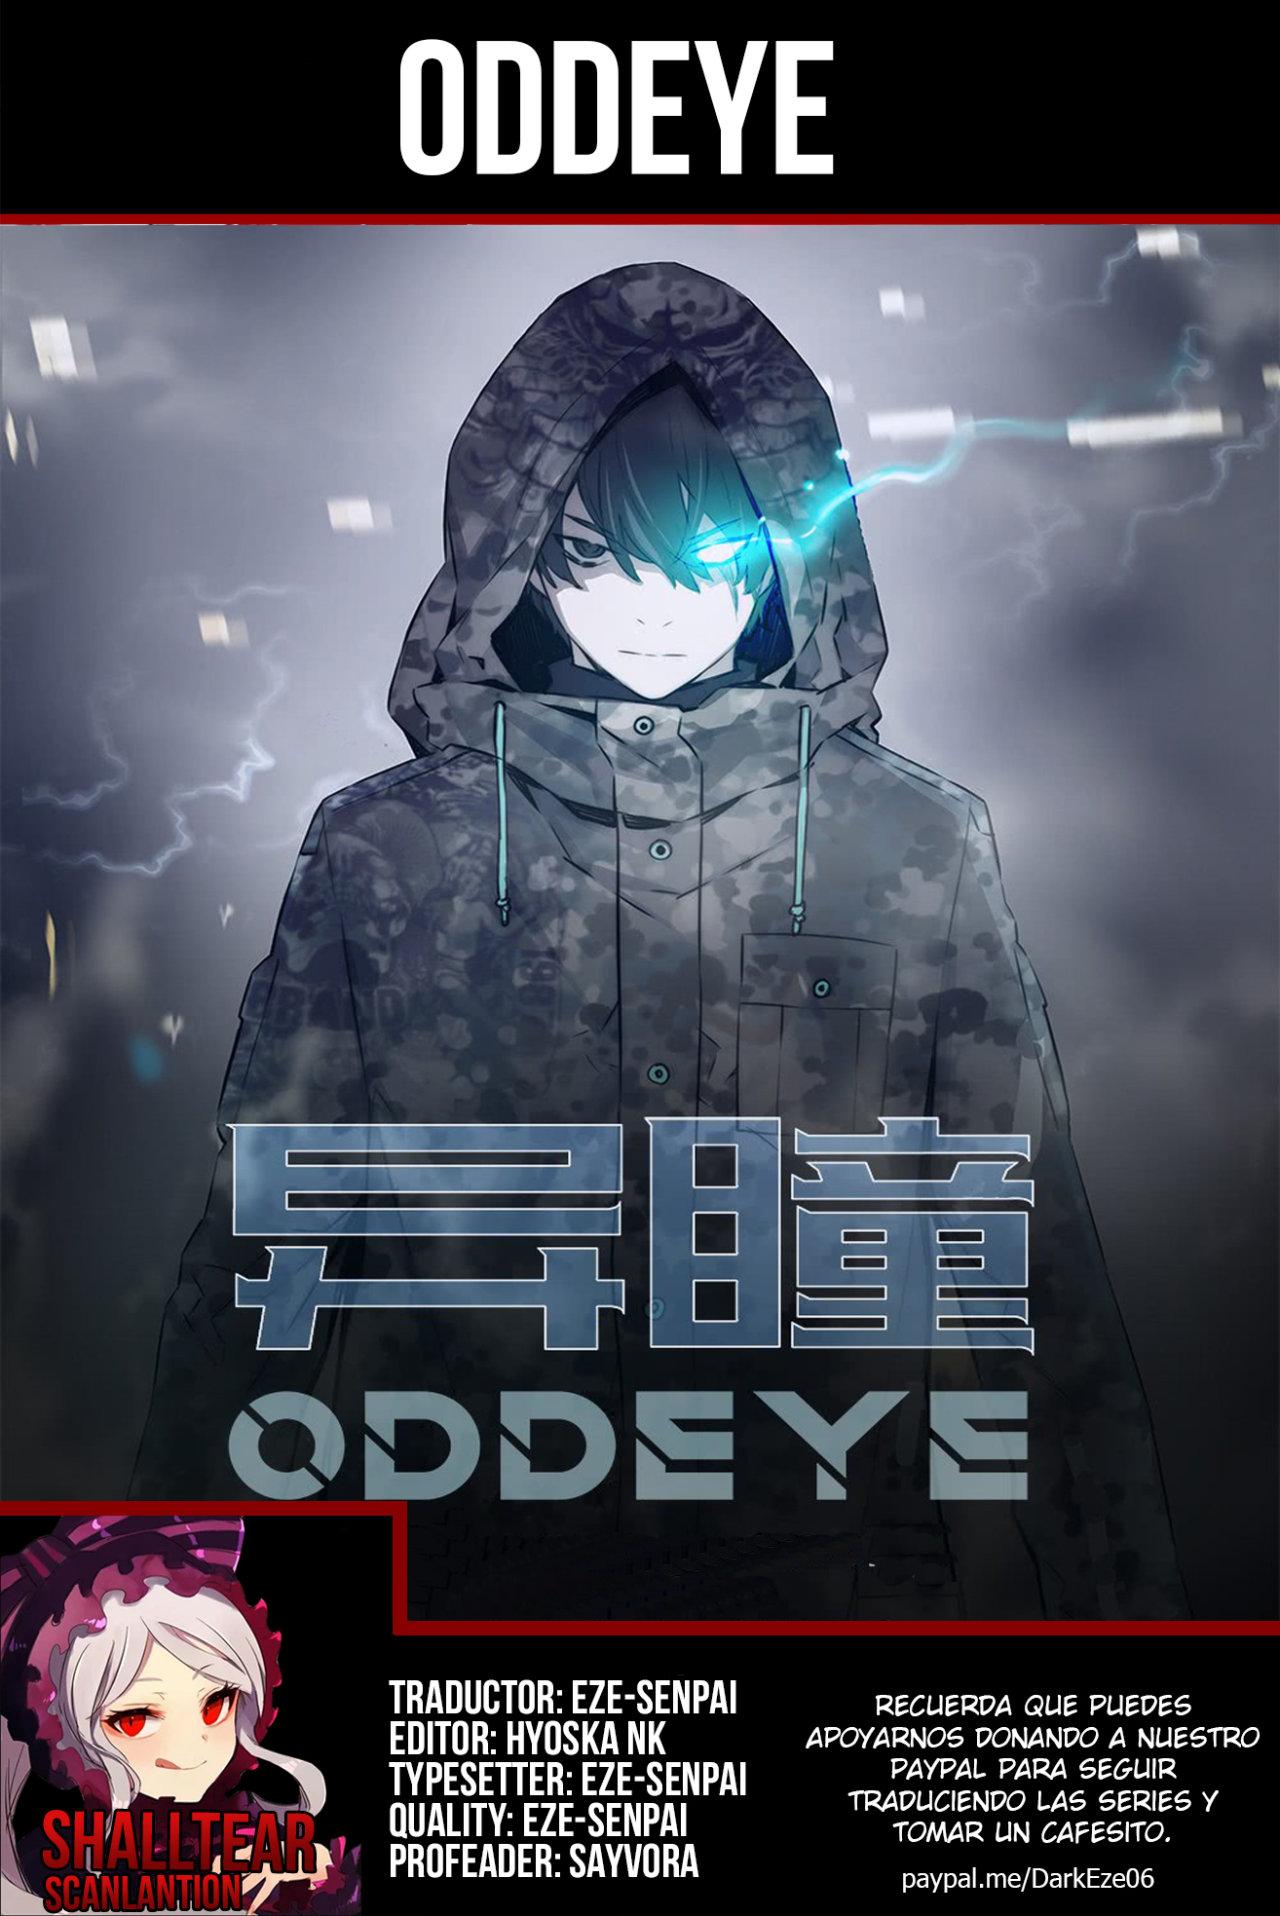 https://nine.mangadogs.com/es_manga/pic9/37/37221/959838/099e3740a2e7a44a3eb780140945ddeb.jpg Page 1